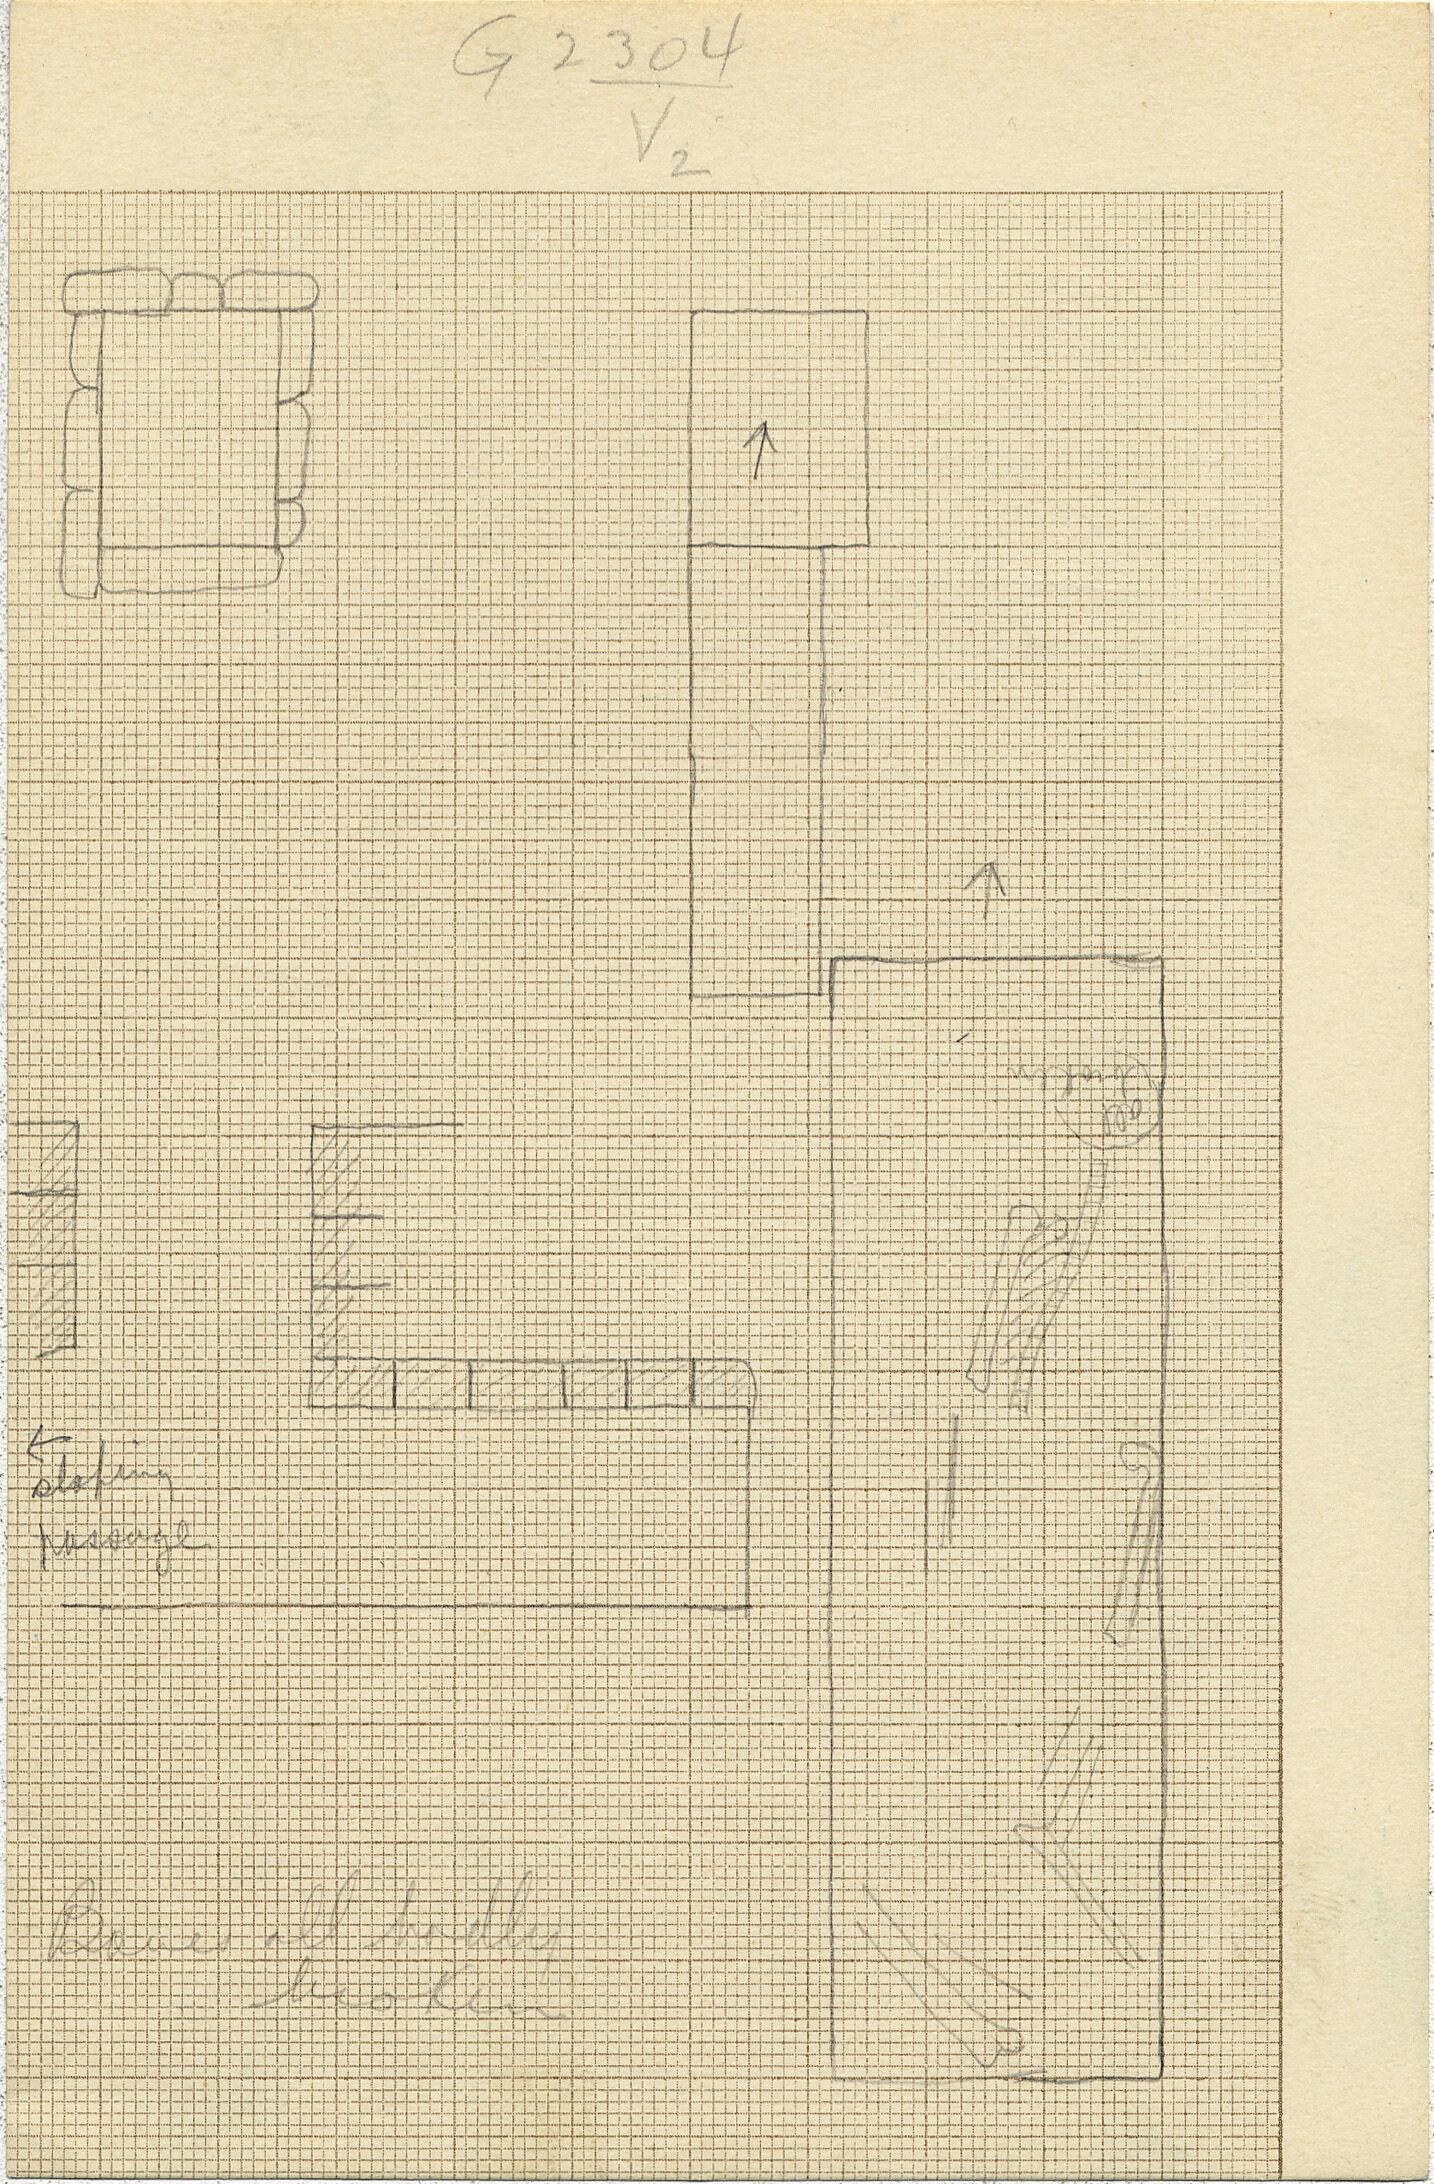 Maps and plans: G 2304, Shaft V1